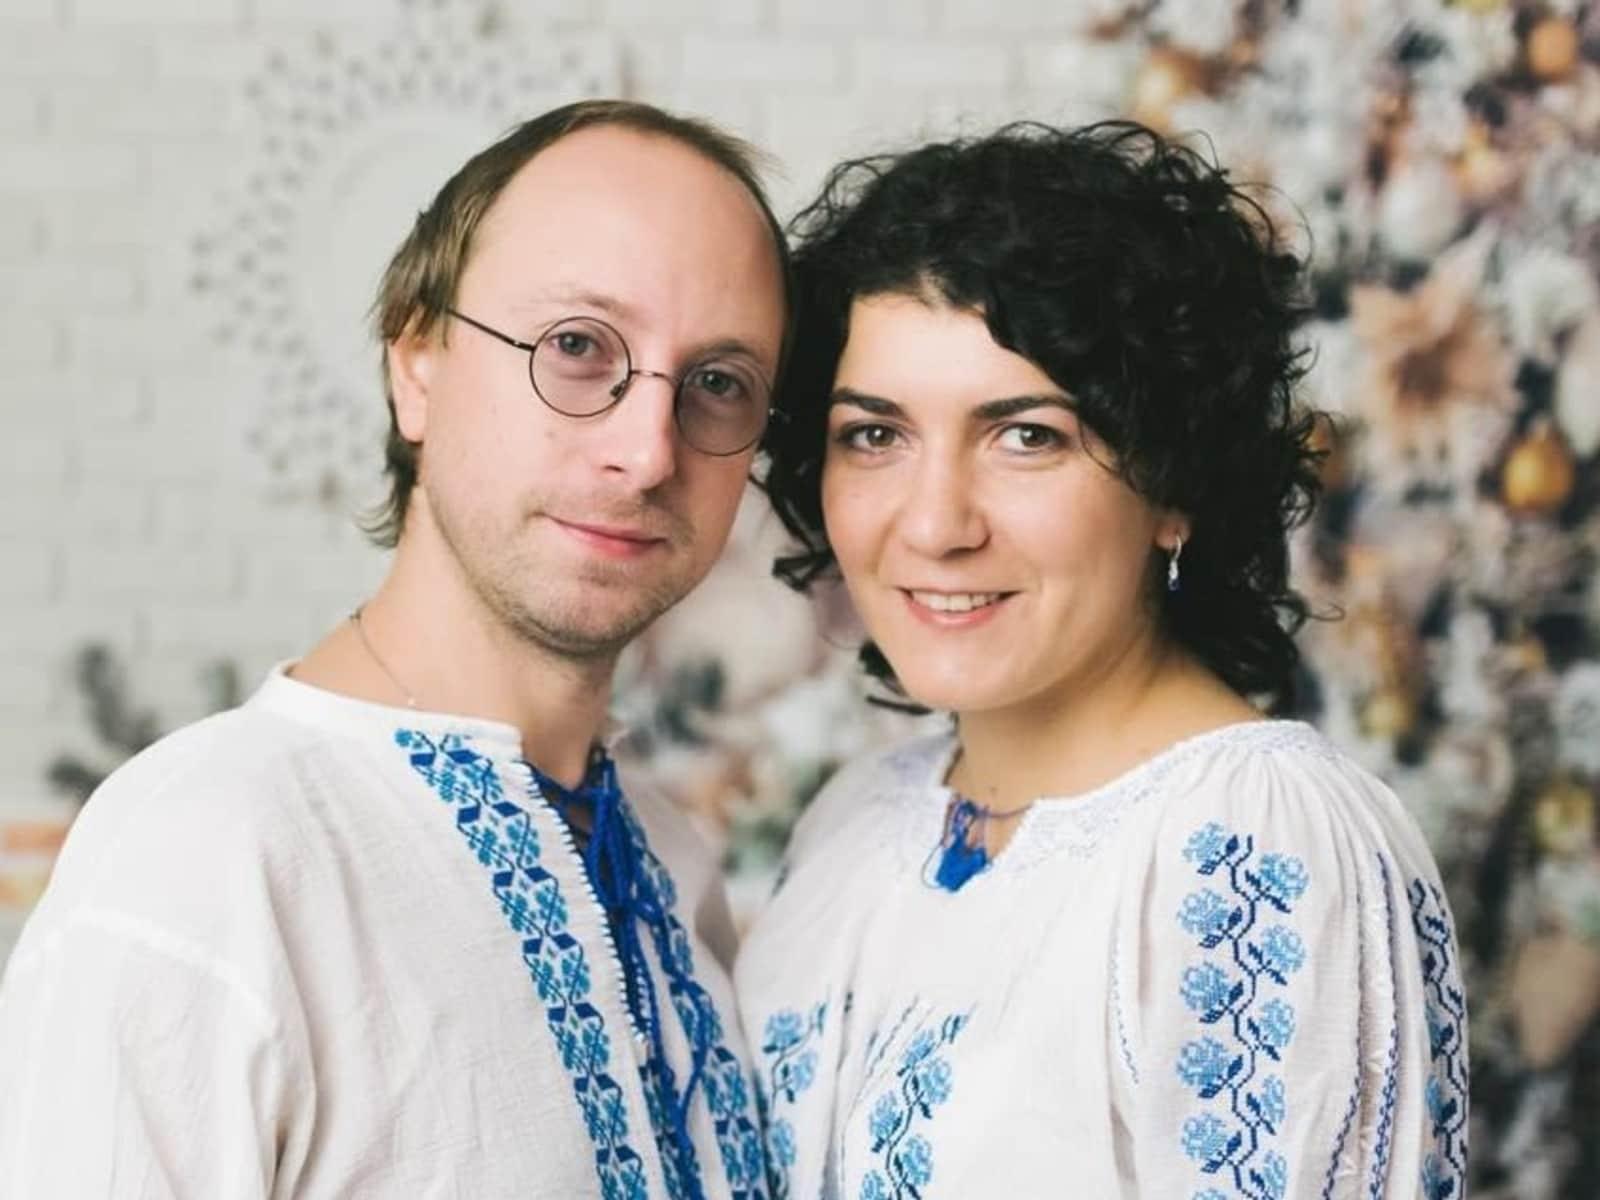 Oana & Marius from Bucharest, Romania